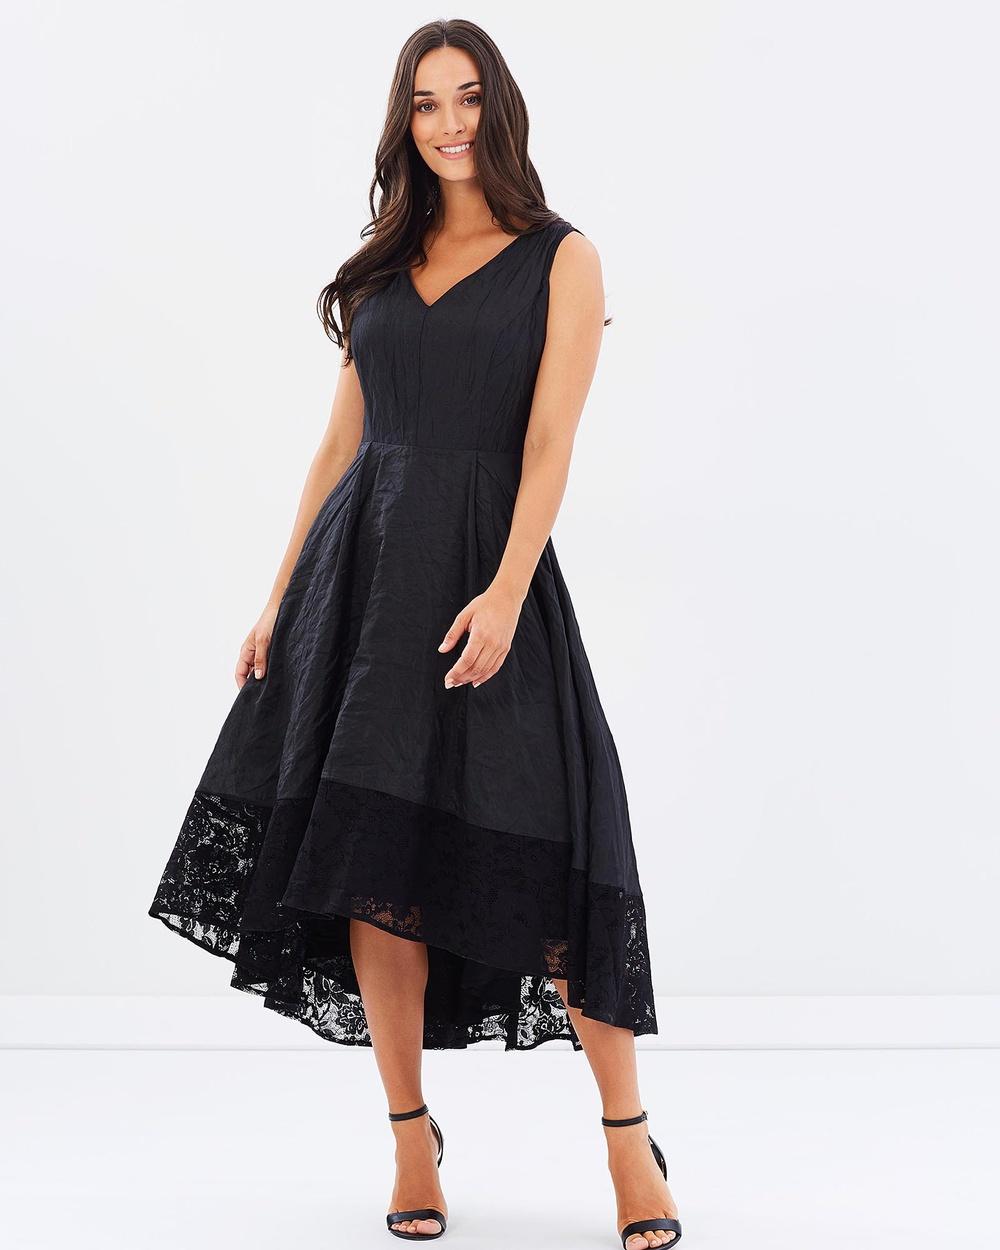 Faye Black Label Midnight Dance V Neck Flare Dress Dresses Ebony Midnight Dance V-Neck Flare Dress